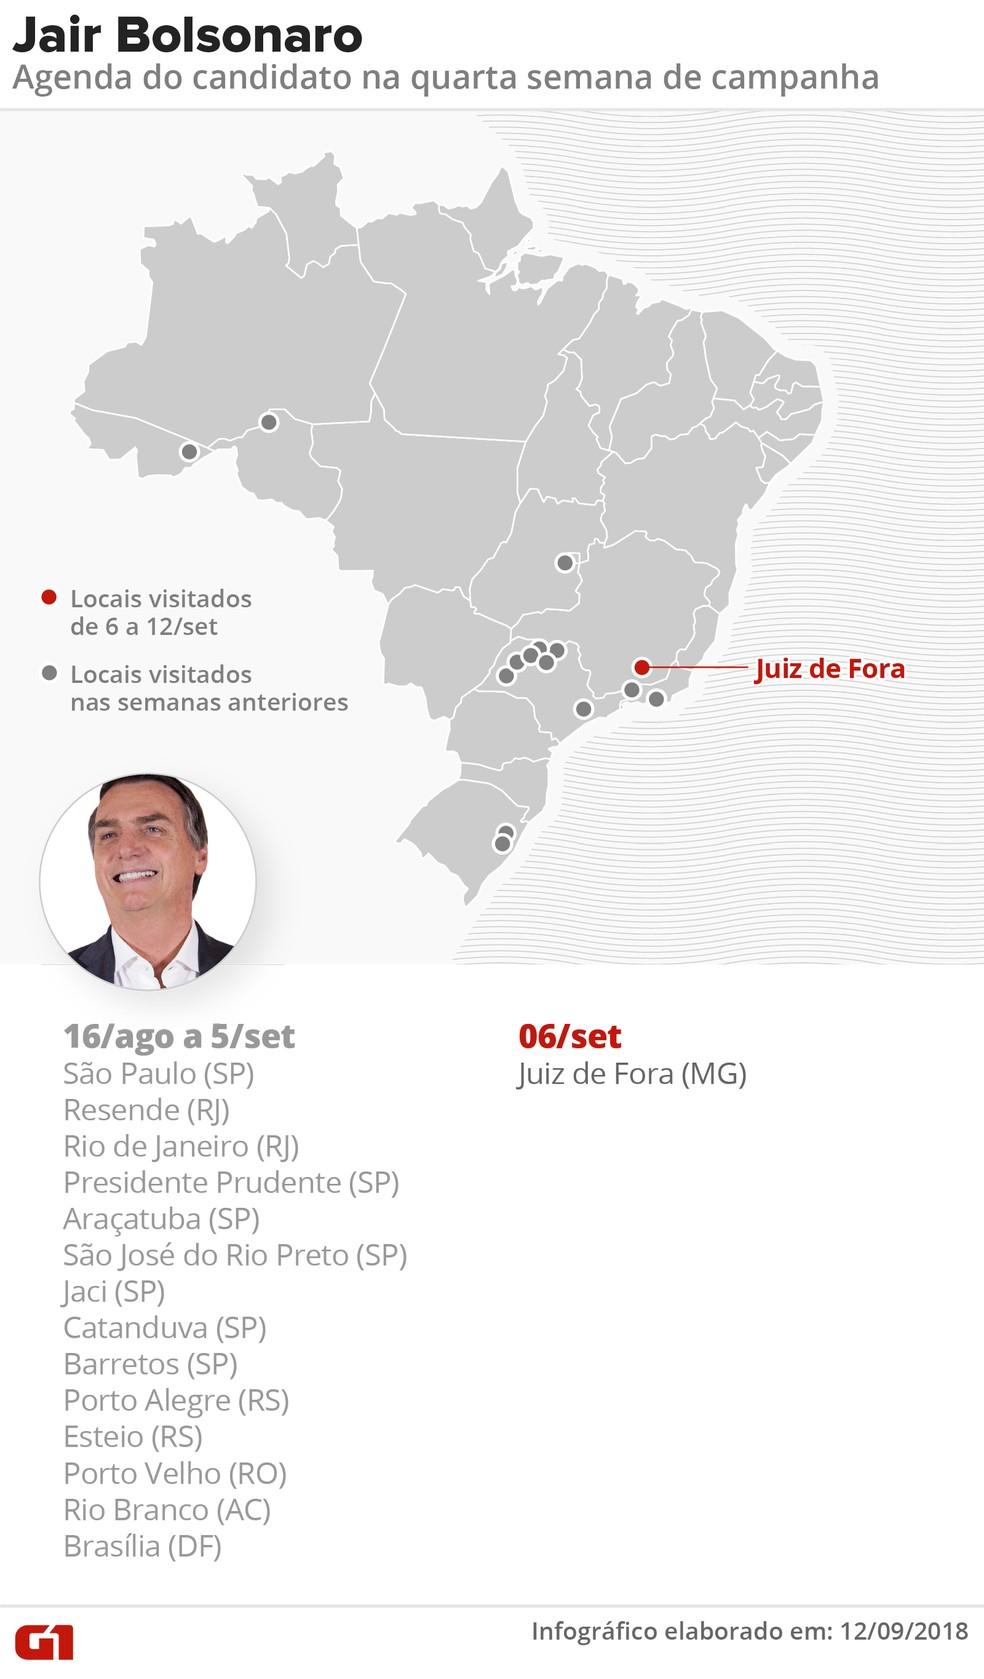 Agenda do candidato Jair Bolsonaro (PSL) na 4ª semana de campanha presidencial — Foto: Roberta Jaworski/G1